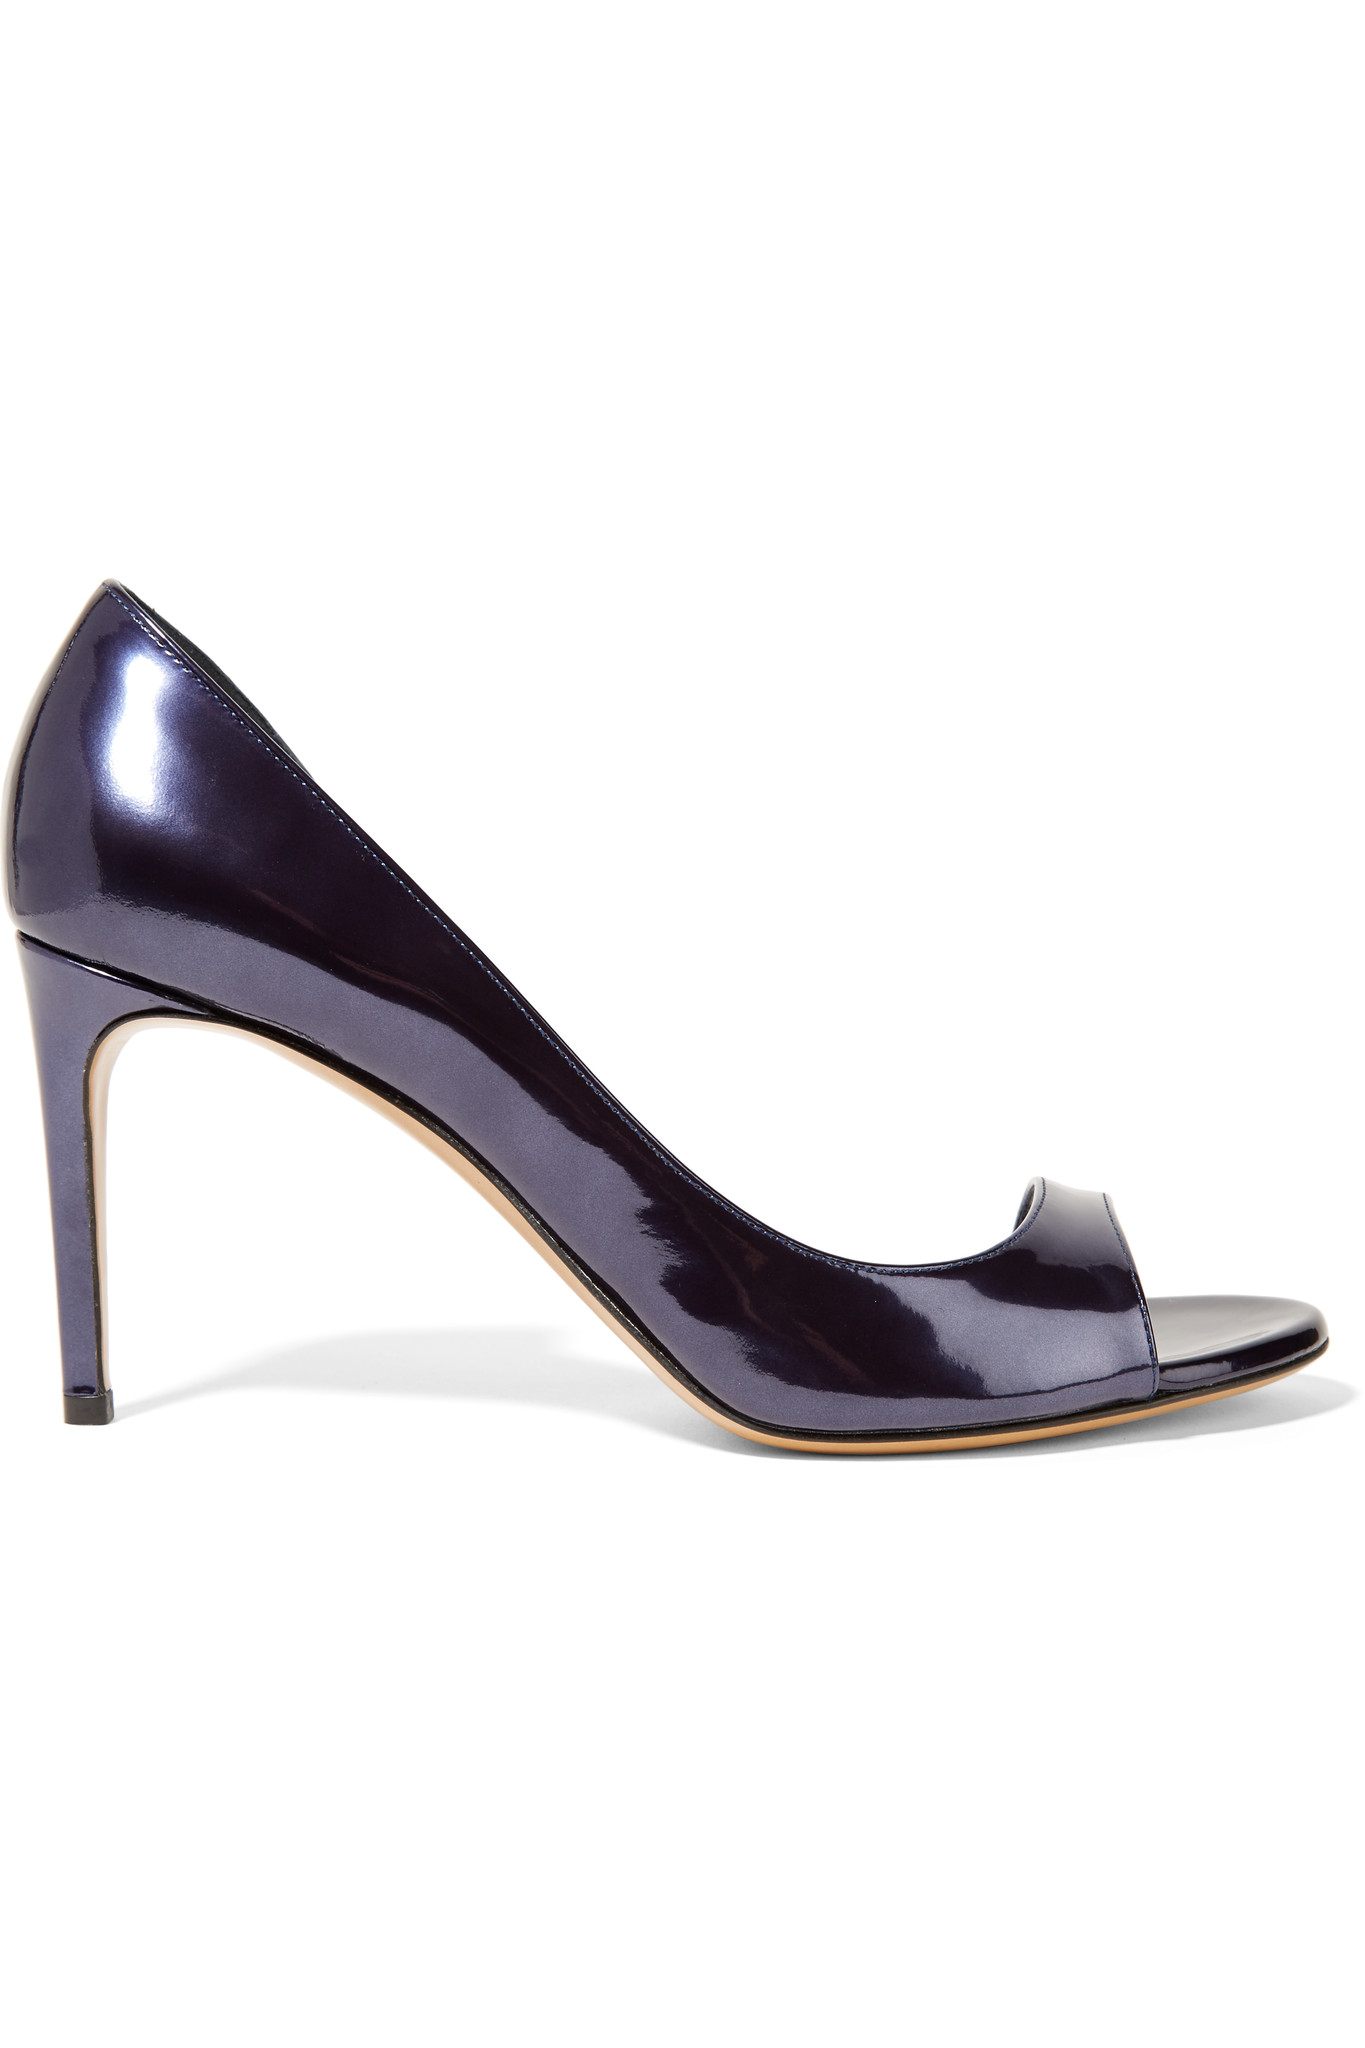 Casadei Metallic Patent-leather Sandals in Blue